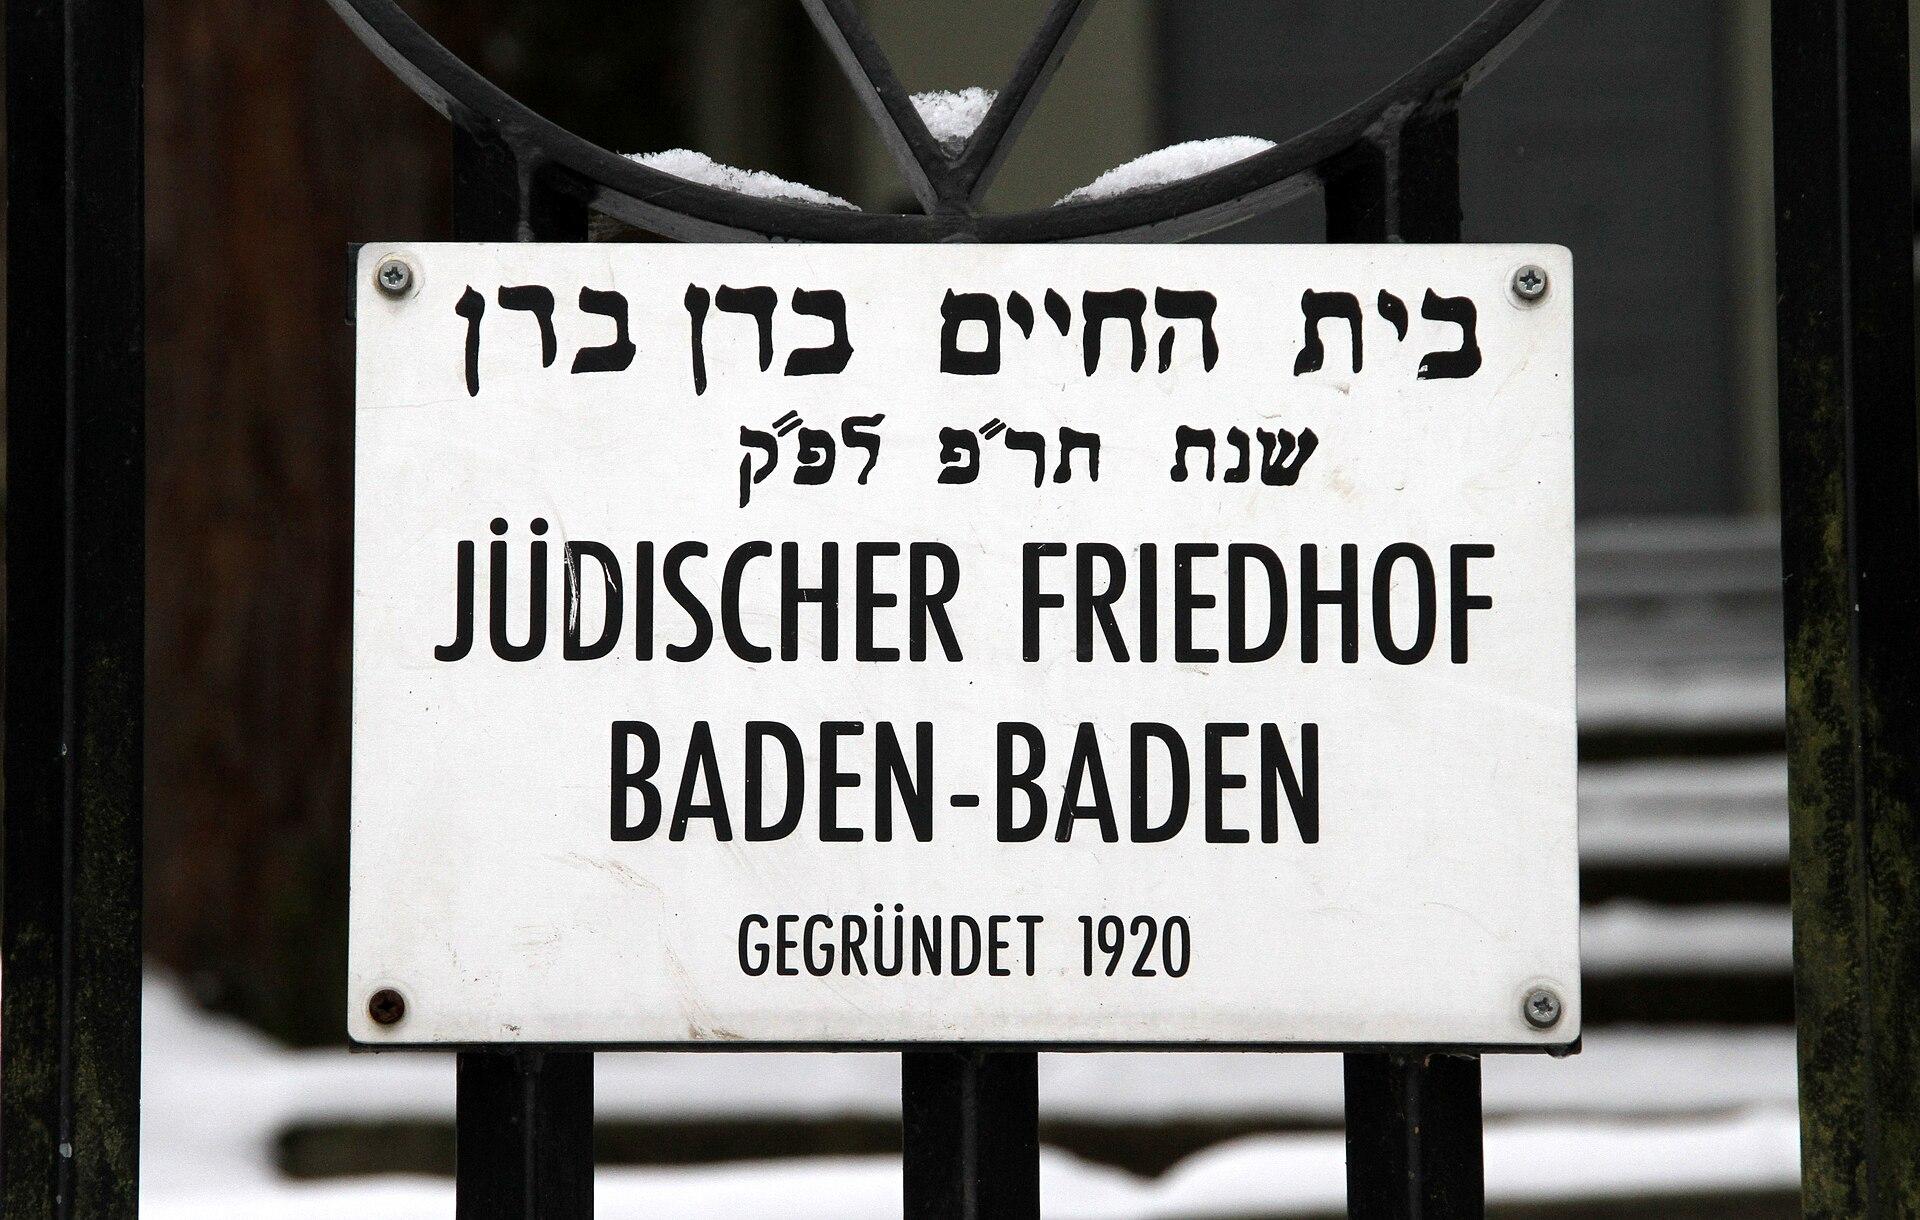 Baden-Baden-Friedhof Lichtental-juedischer Teil-01-gje.JPG